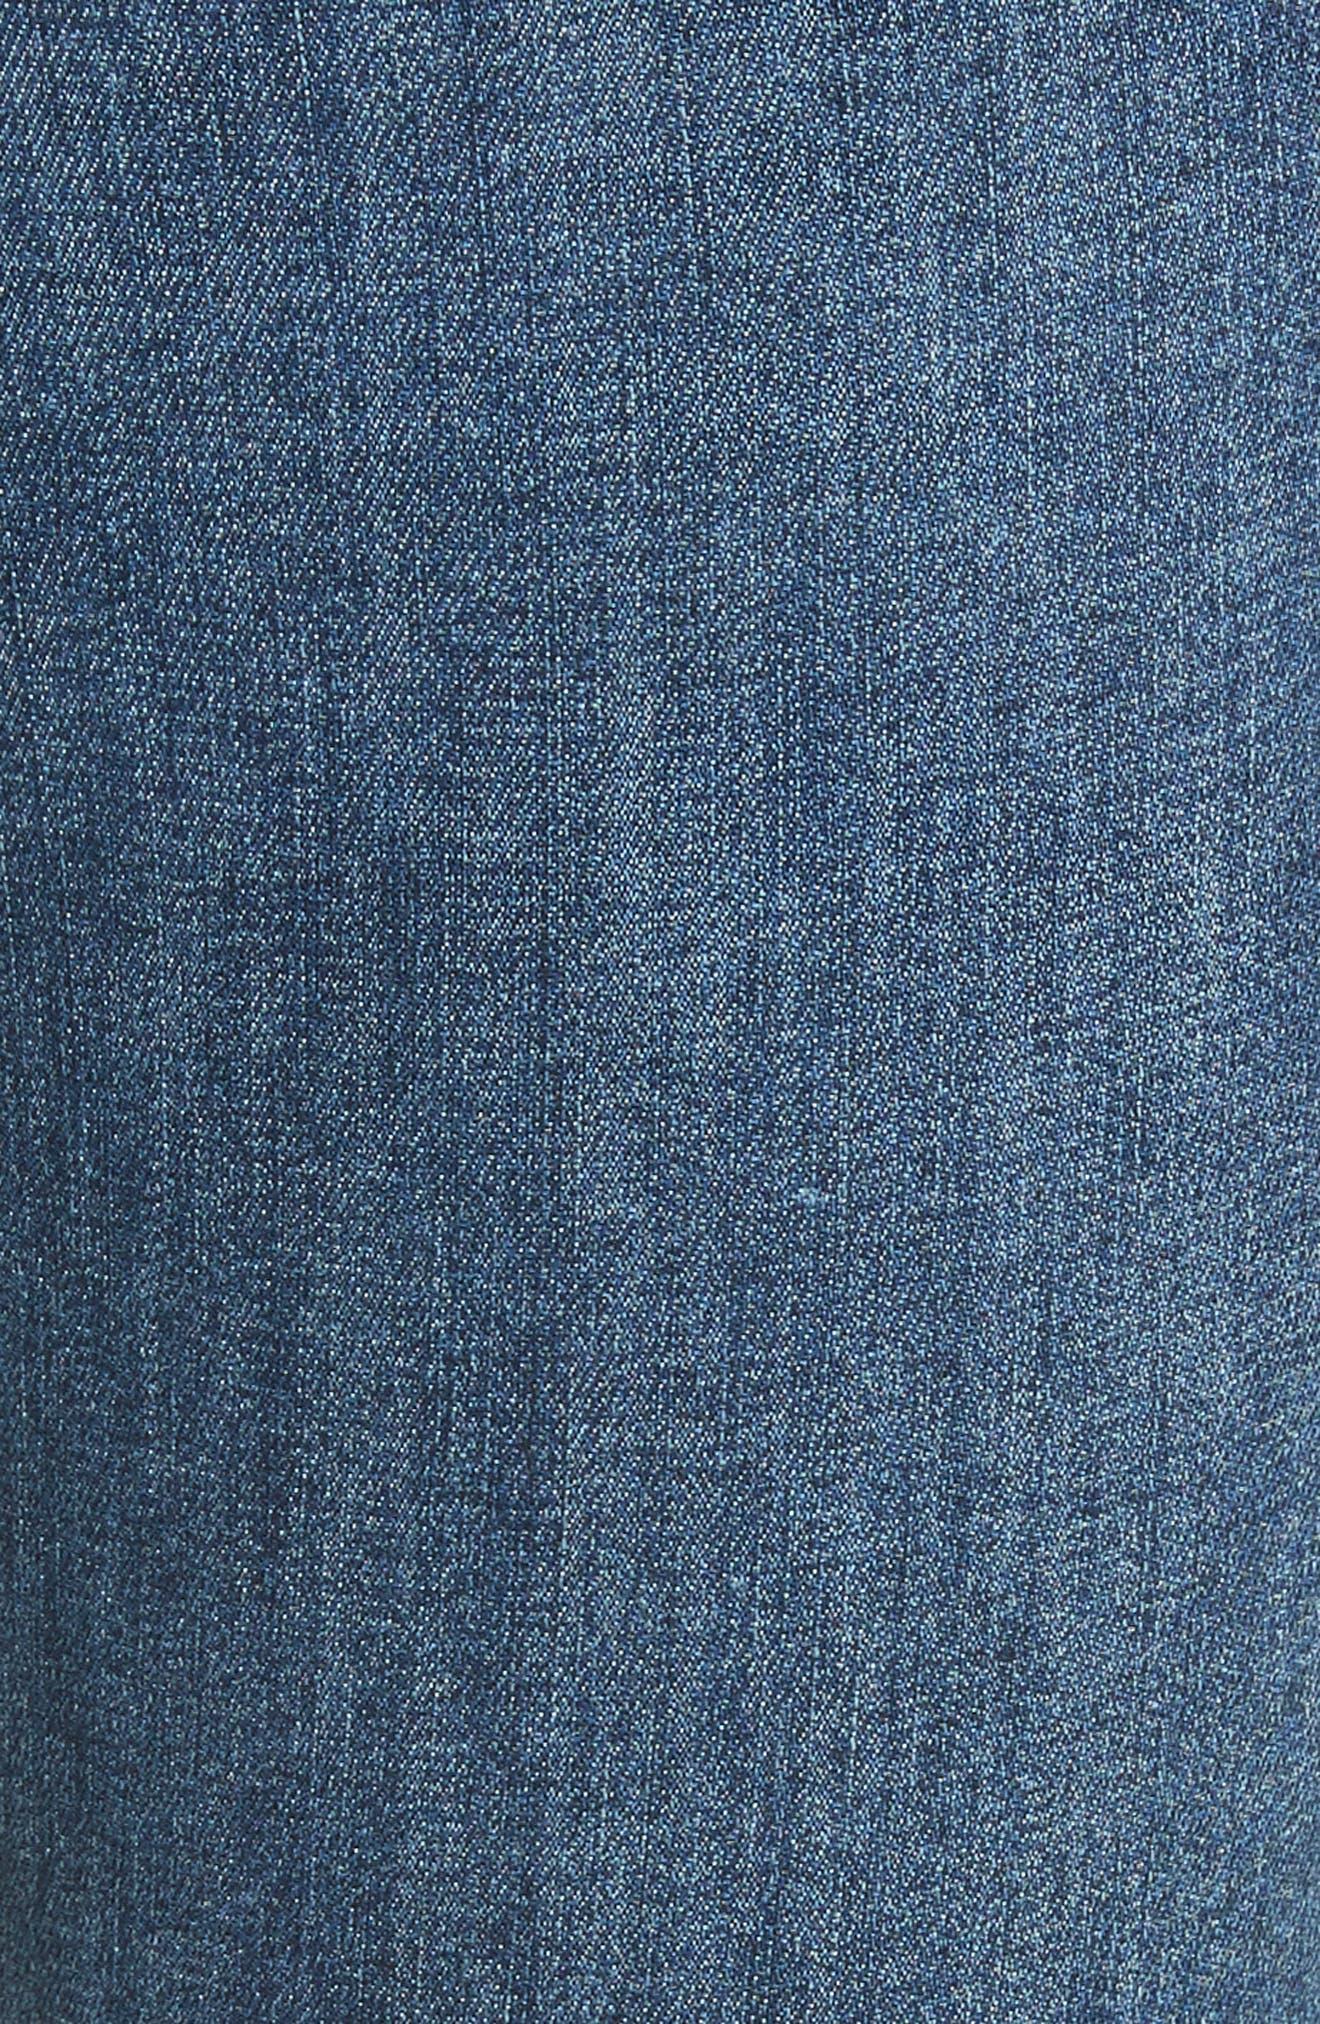 Skinny Jeans,                             Alternate thumbnail 5, color,                             Bloo